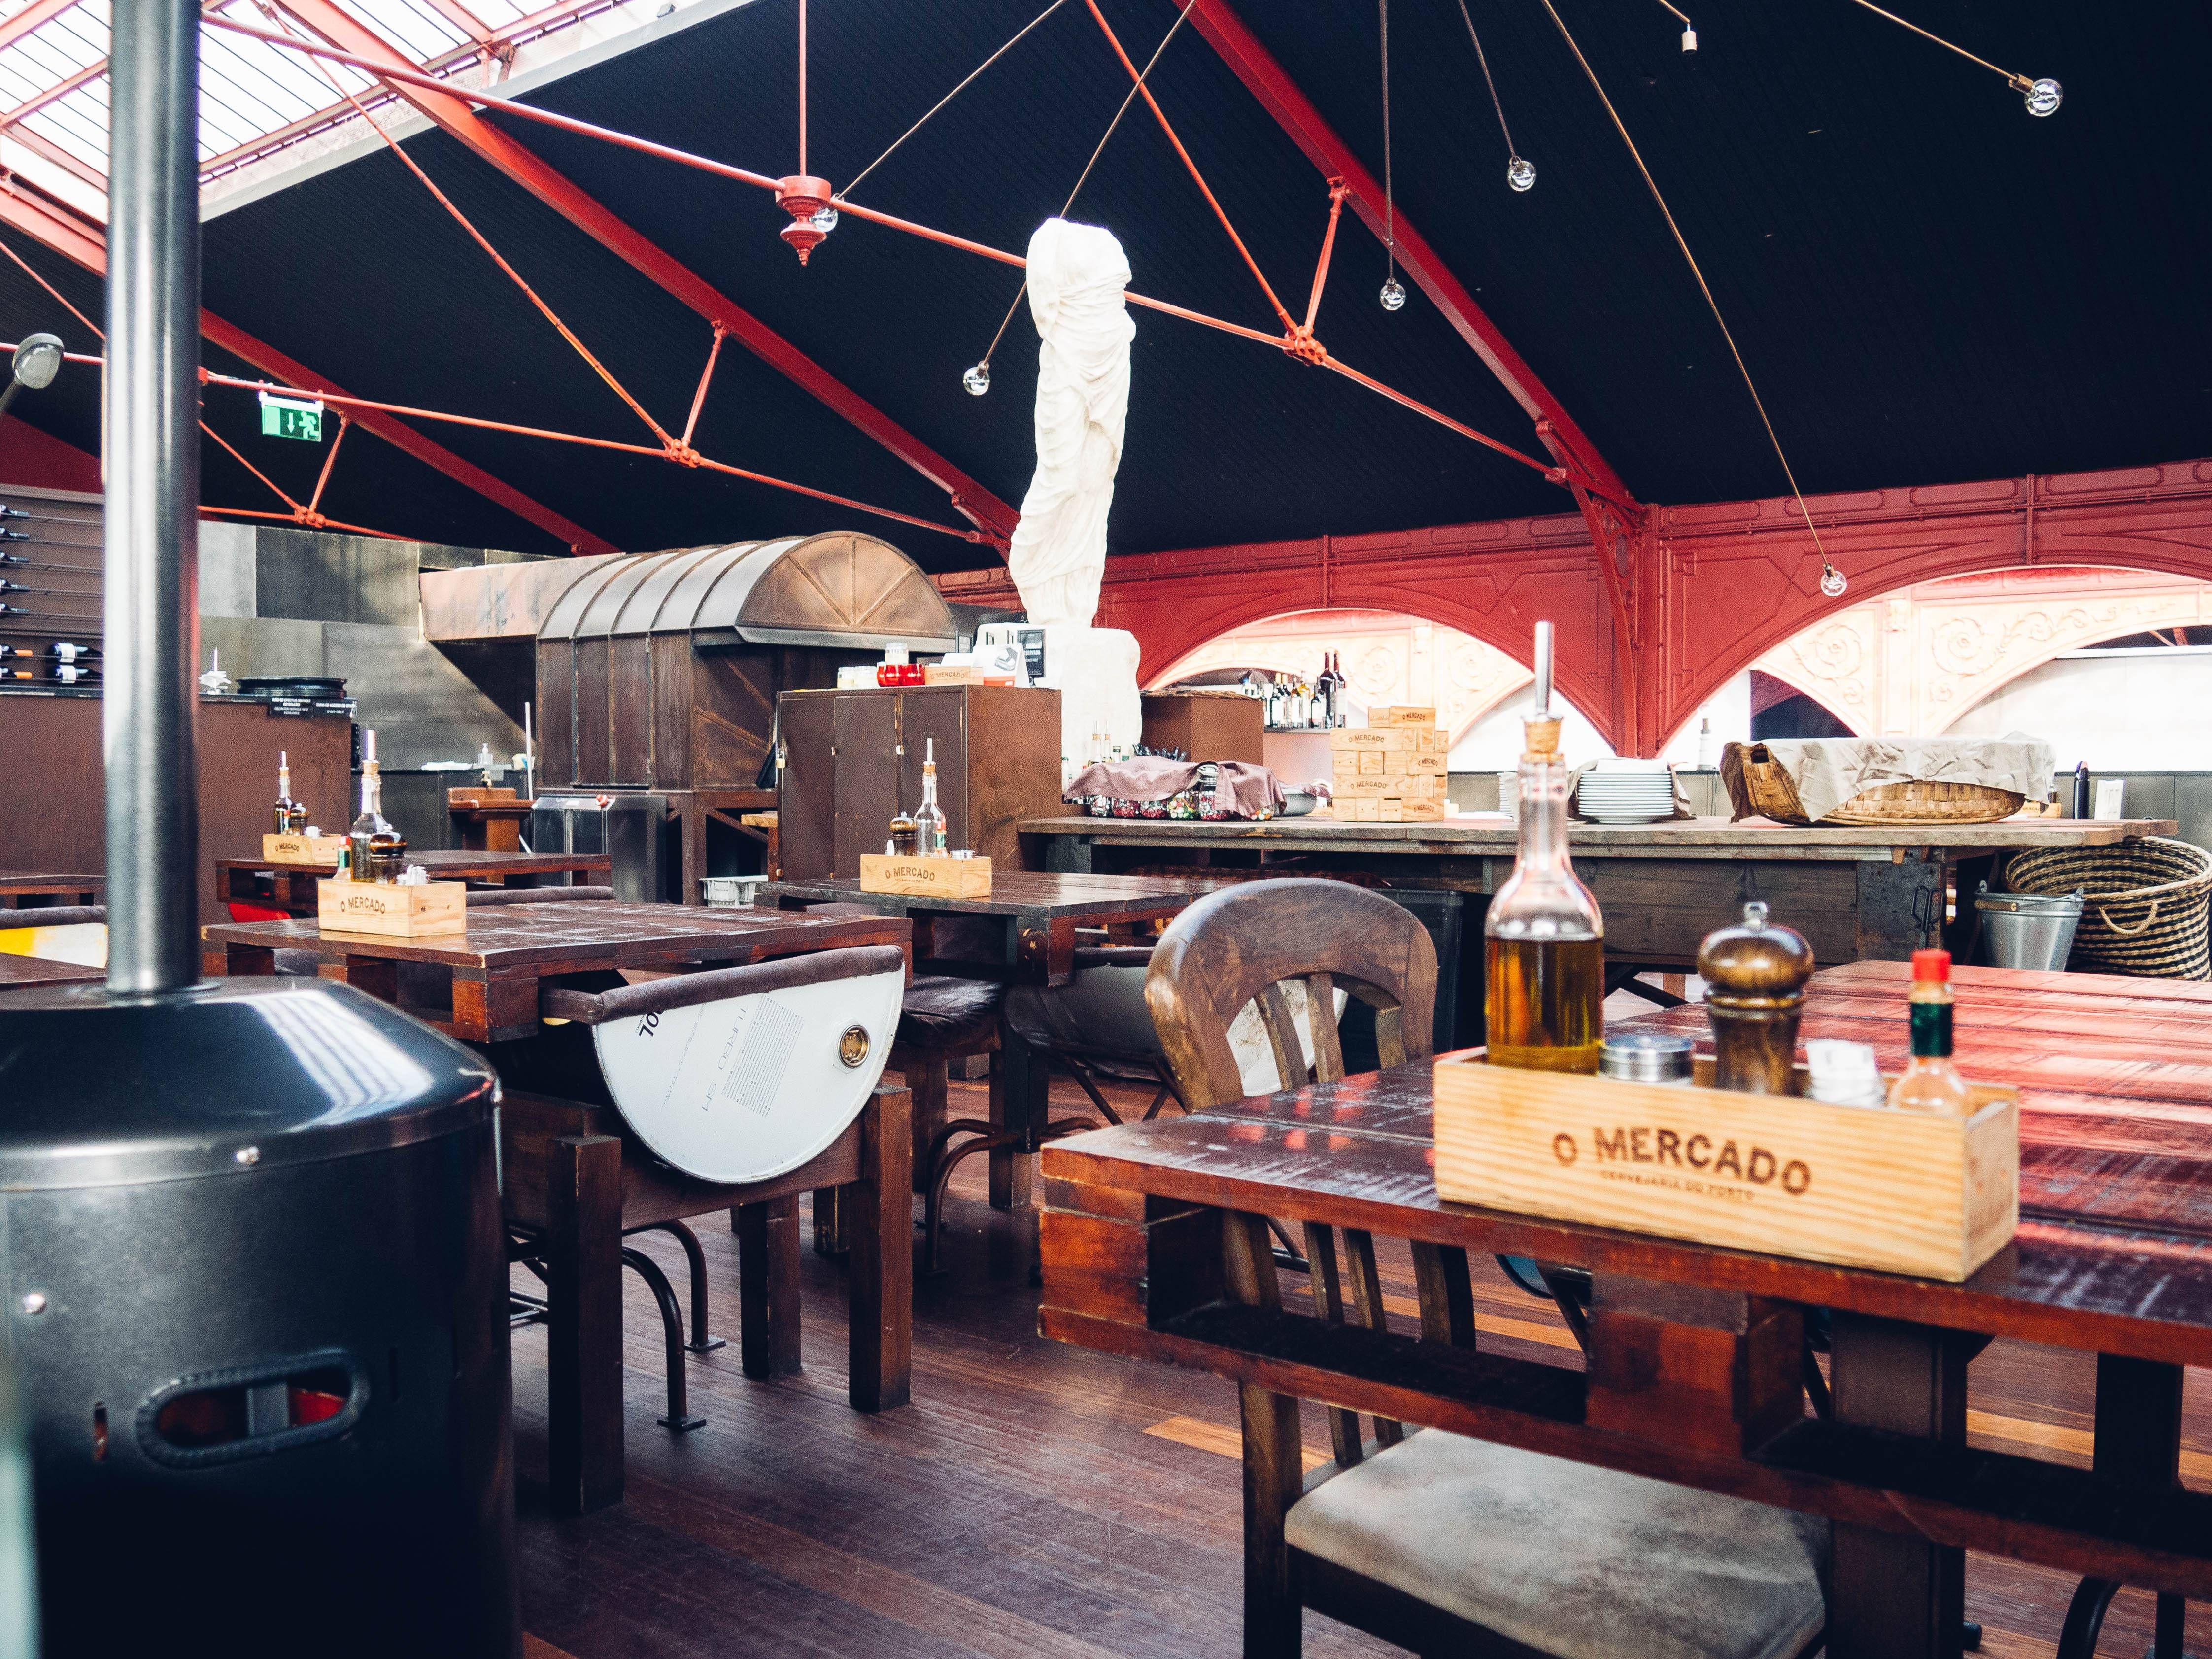 Photo 3: O Mercado, le restaurant industriel